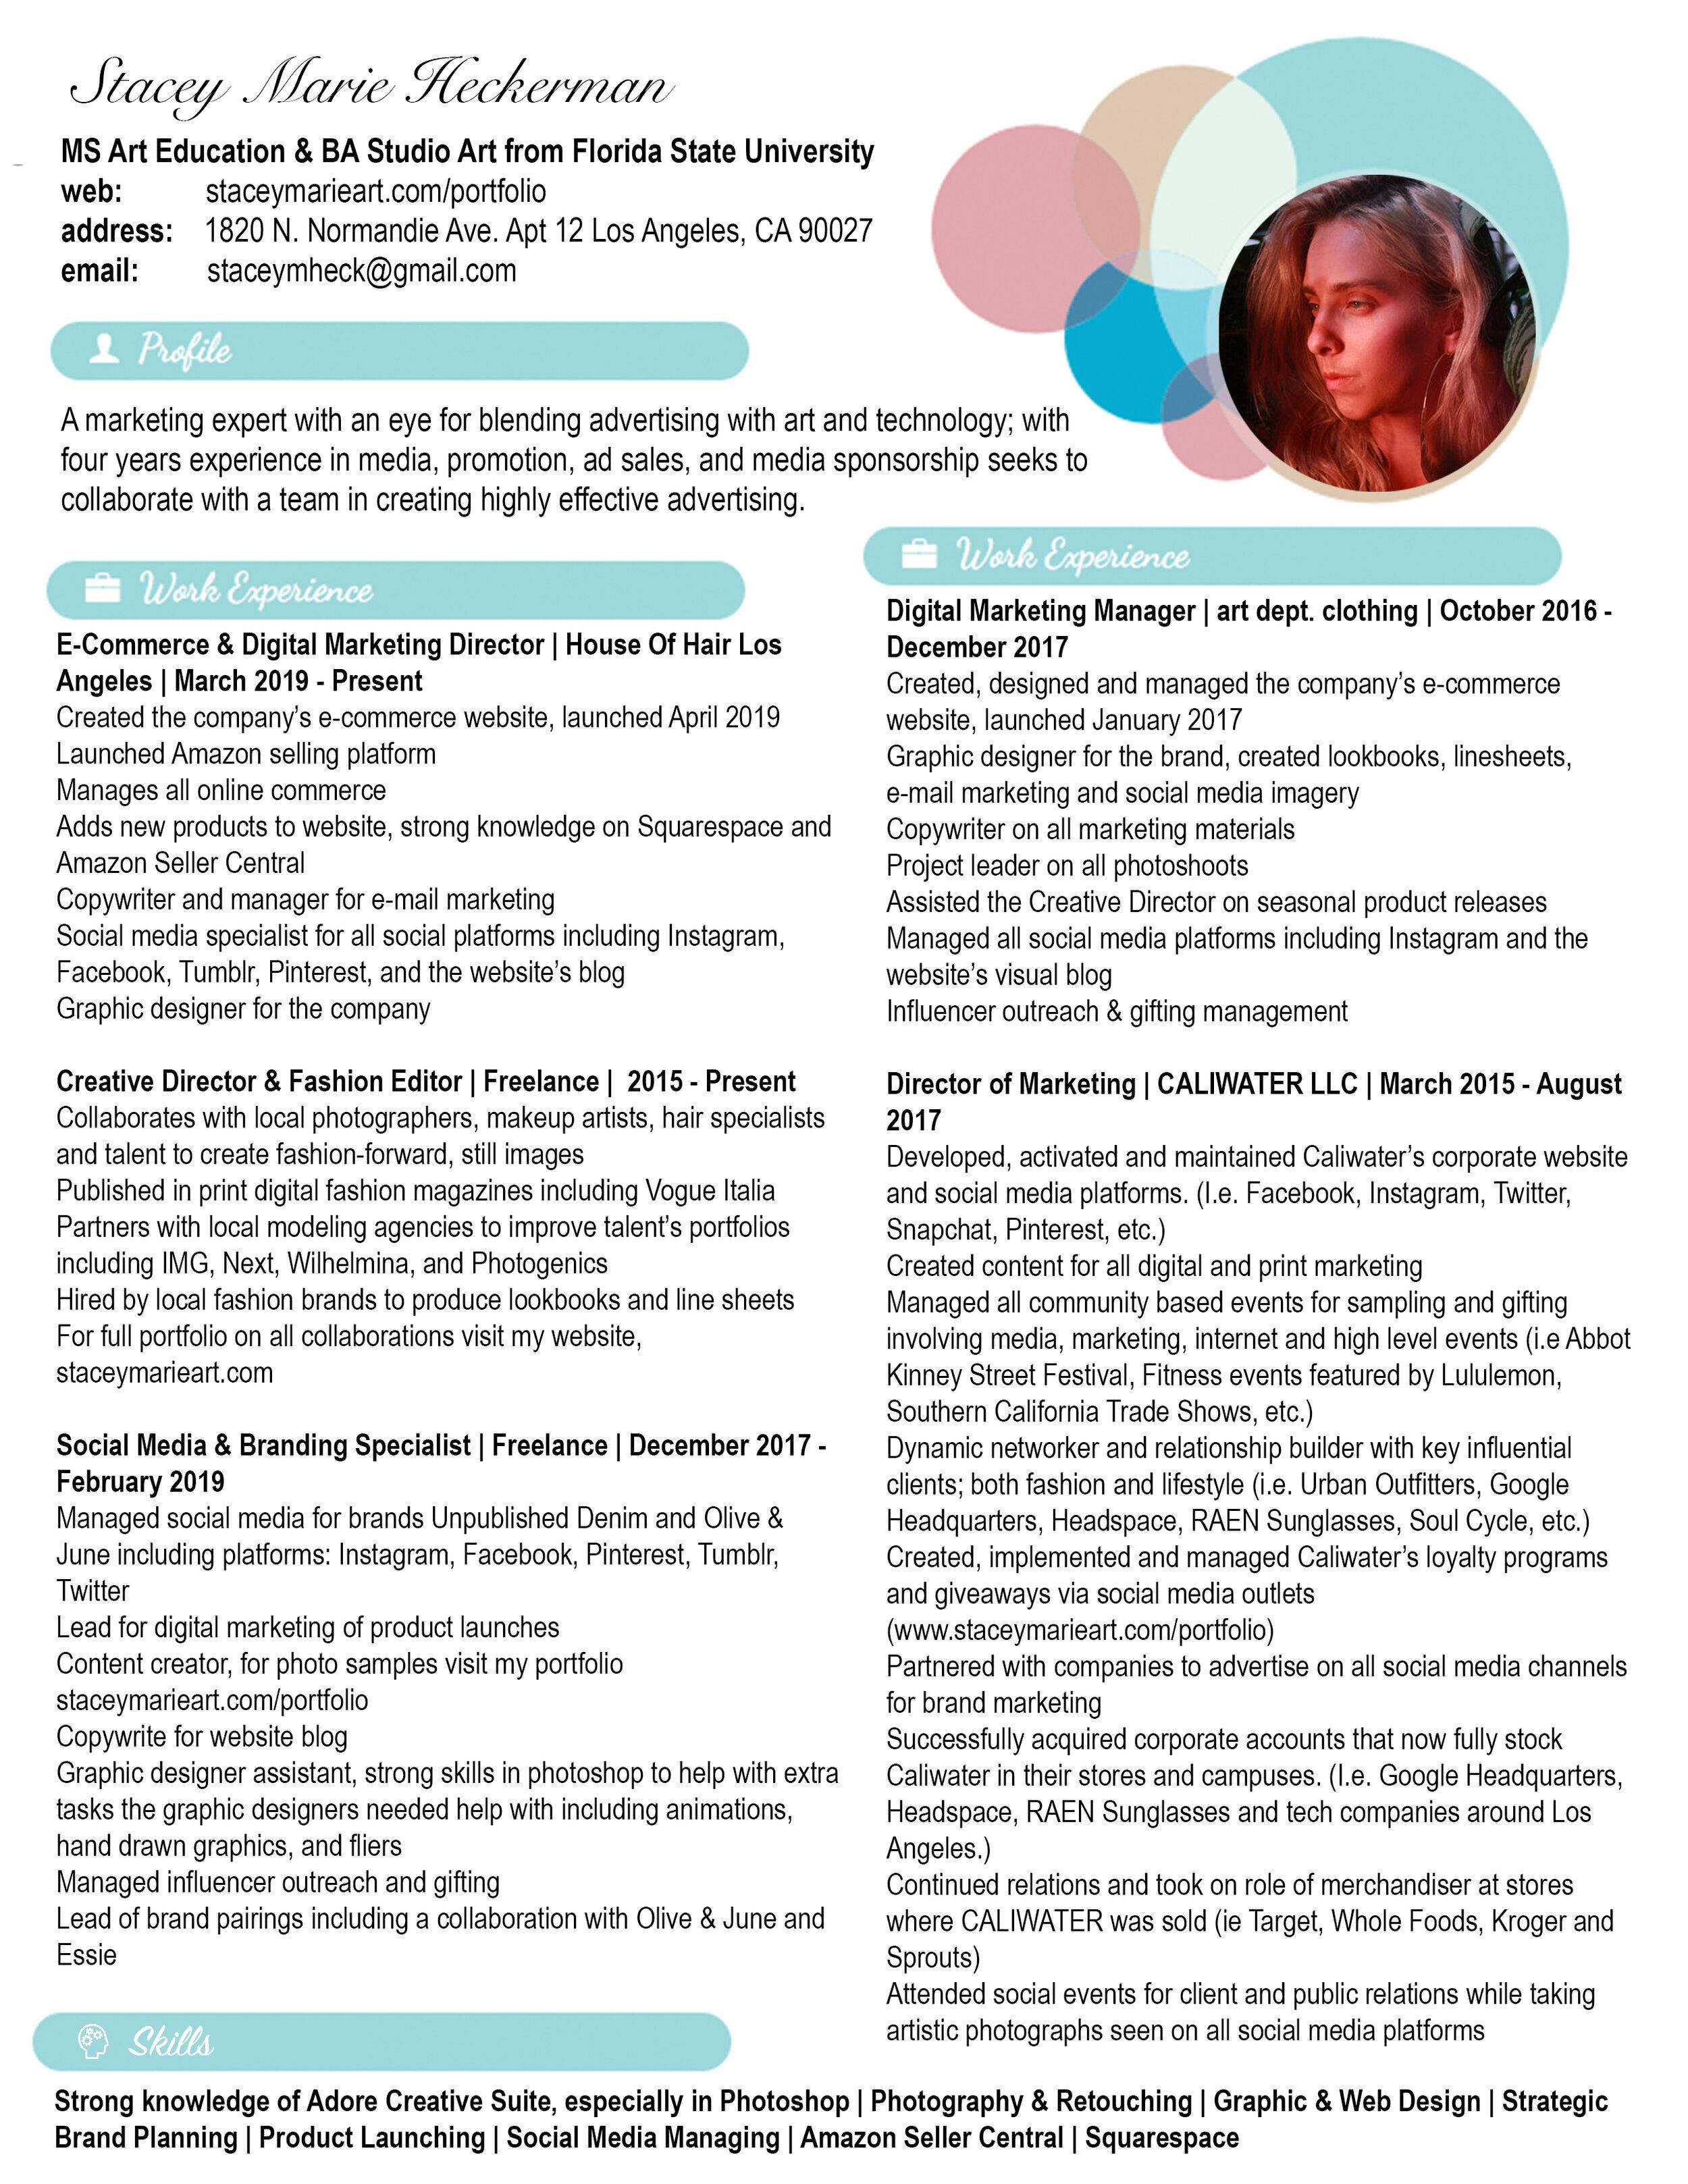 staceyheckerman_resume.jpg